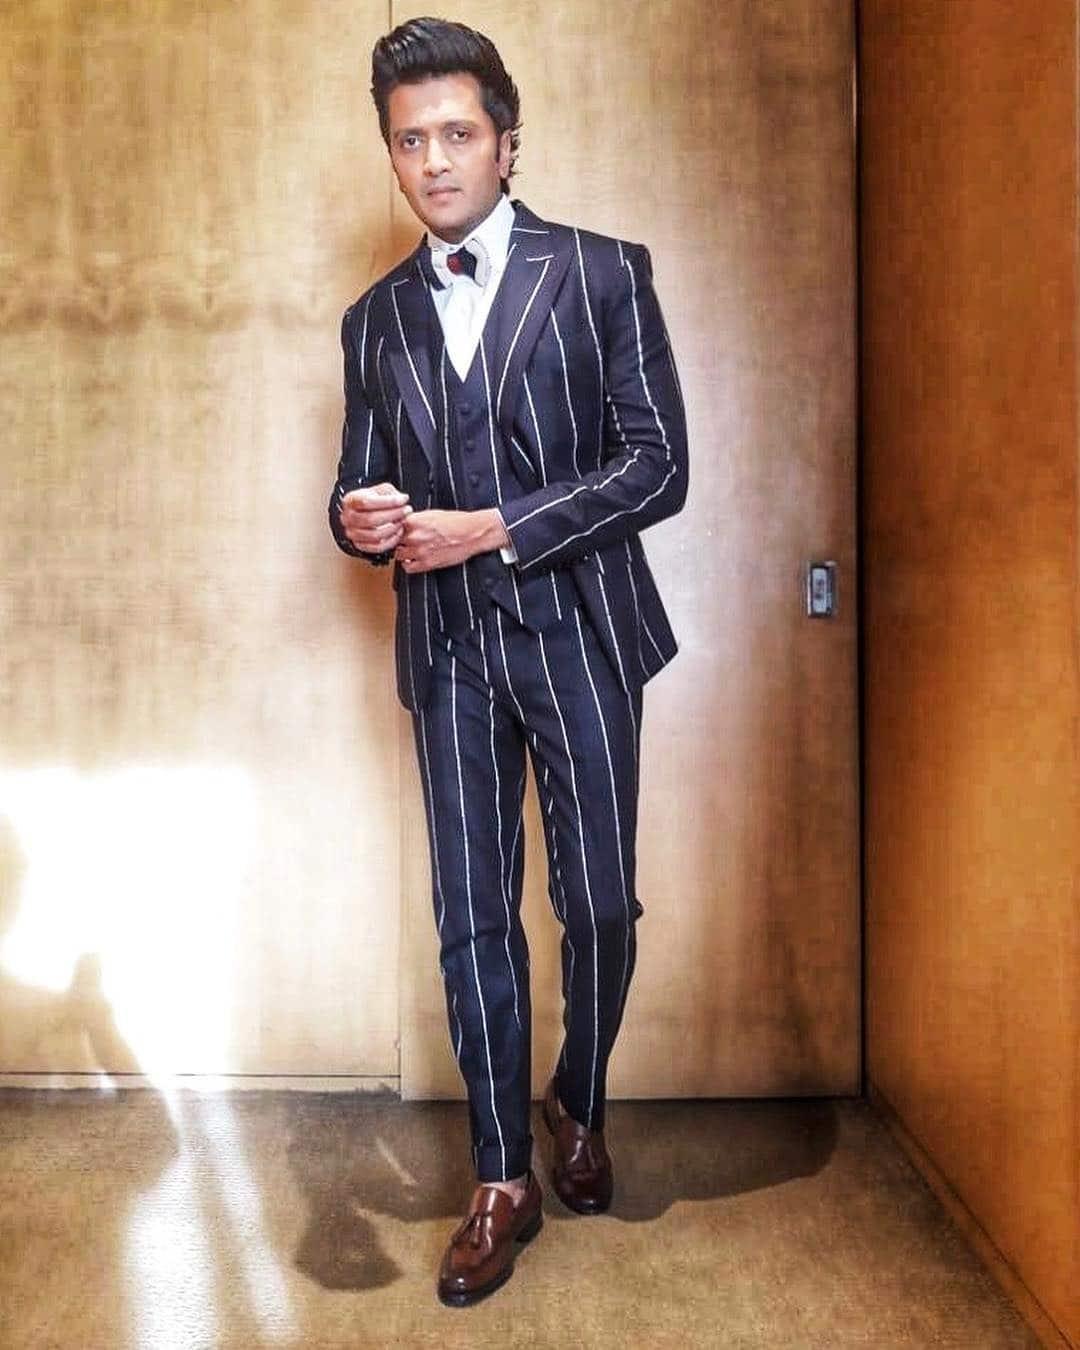 riteish deshmukh suit up photoshoot